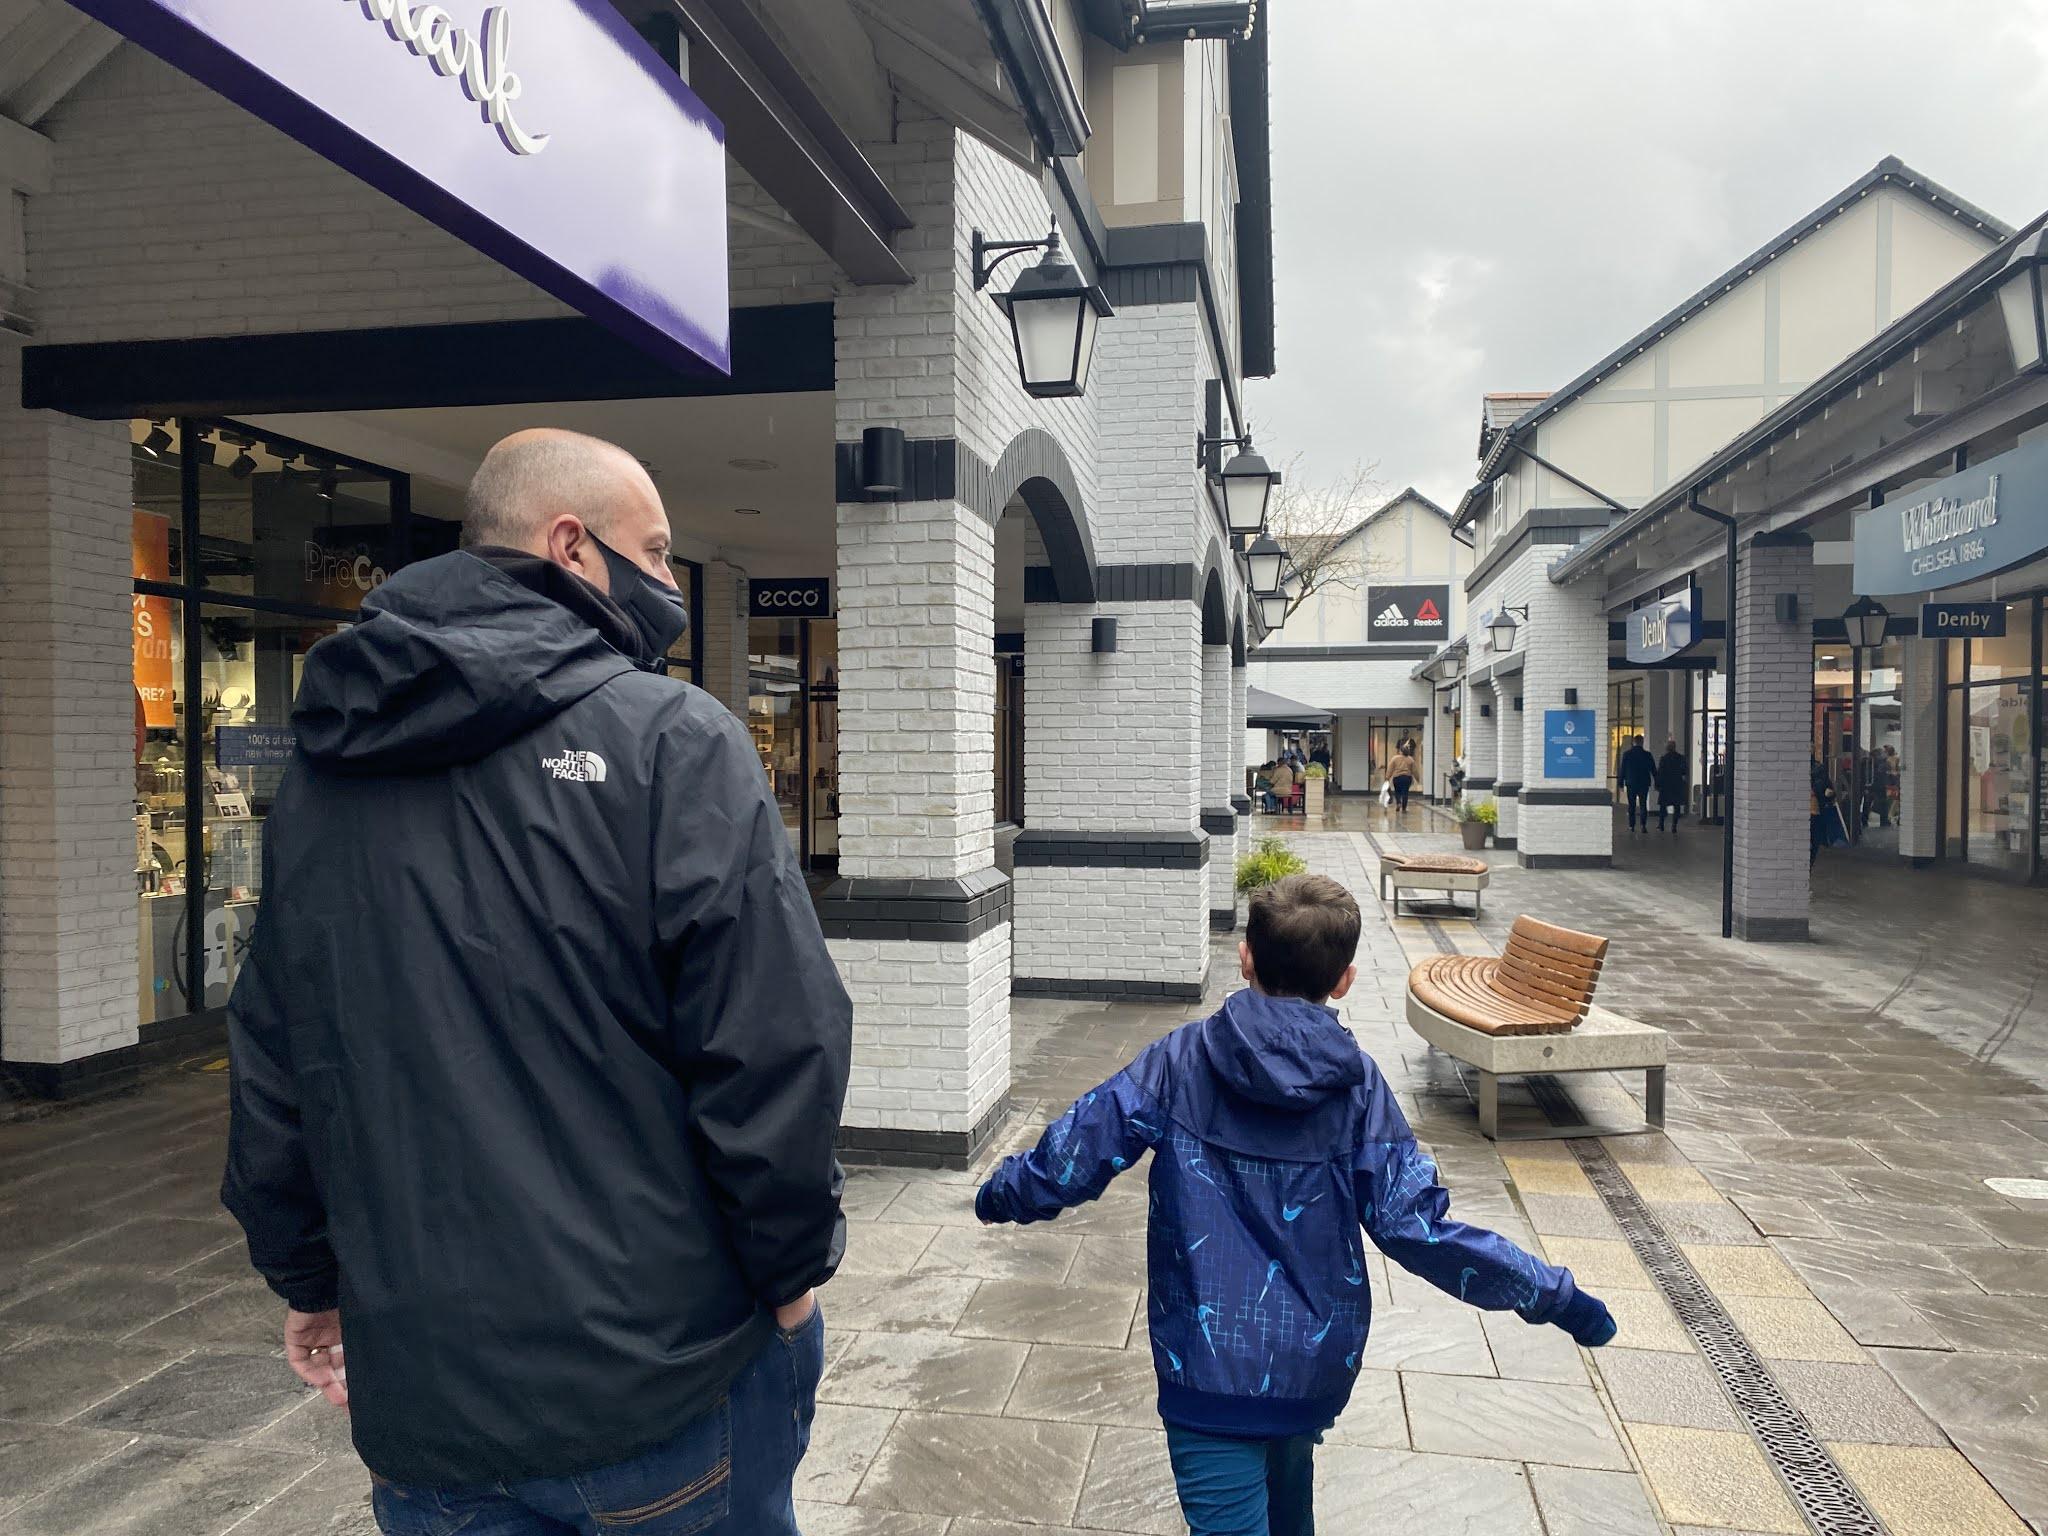 boy and man walking through the shopping centre.